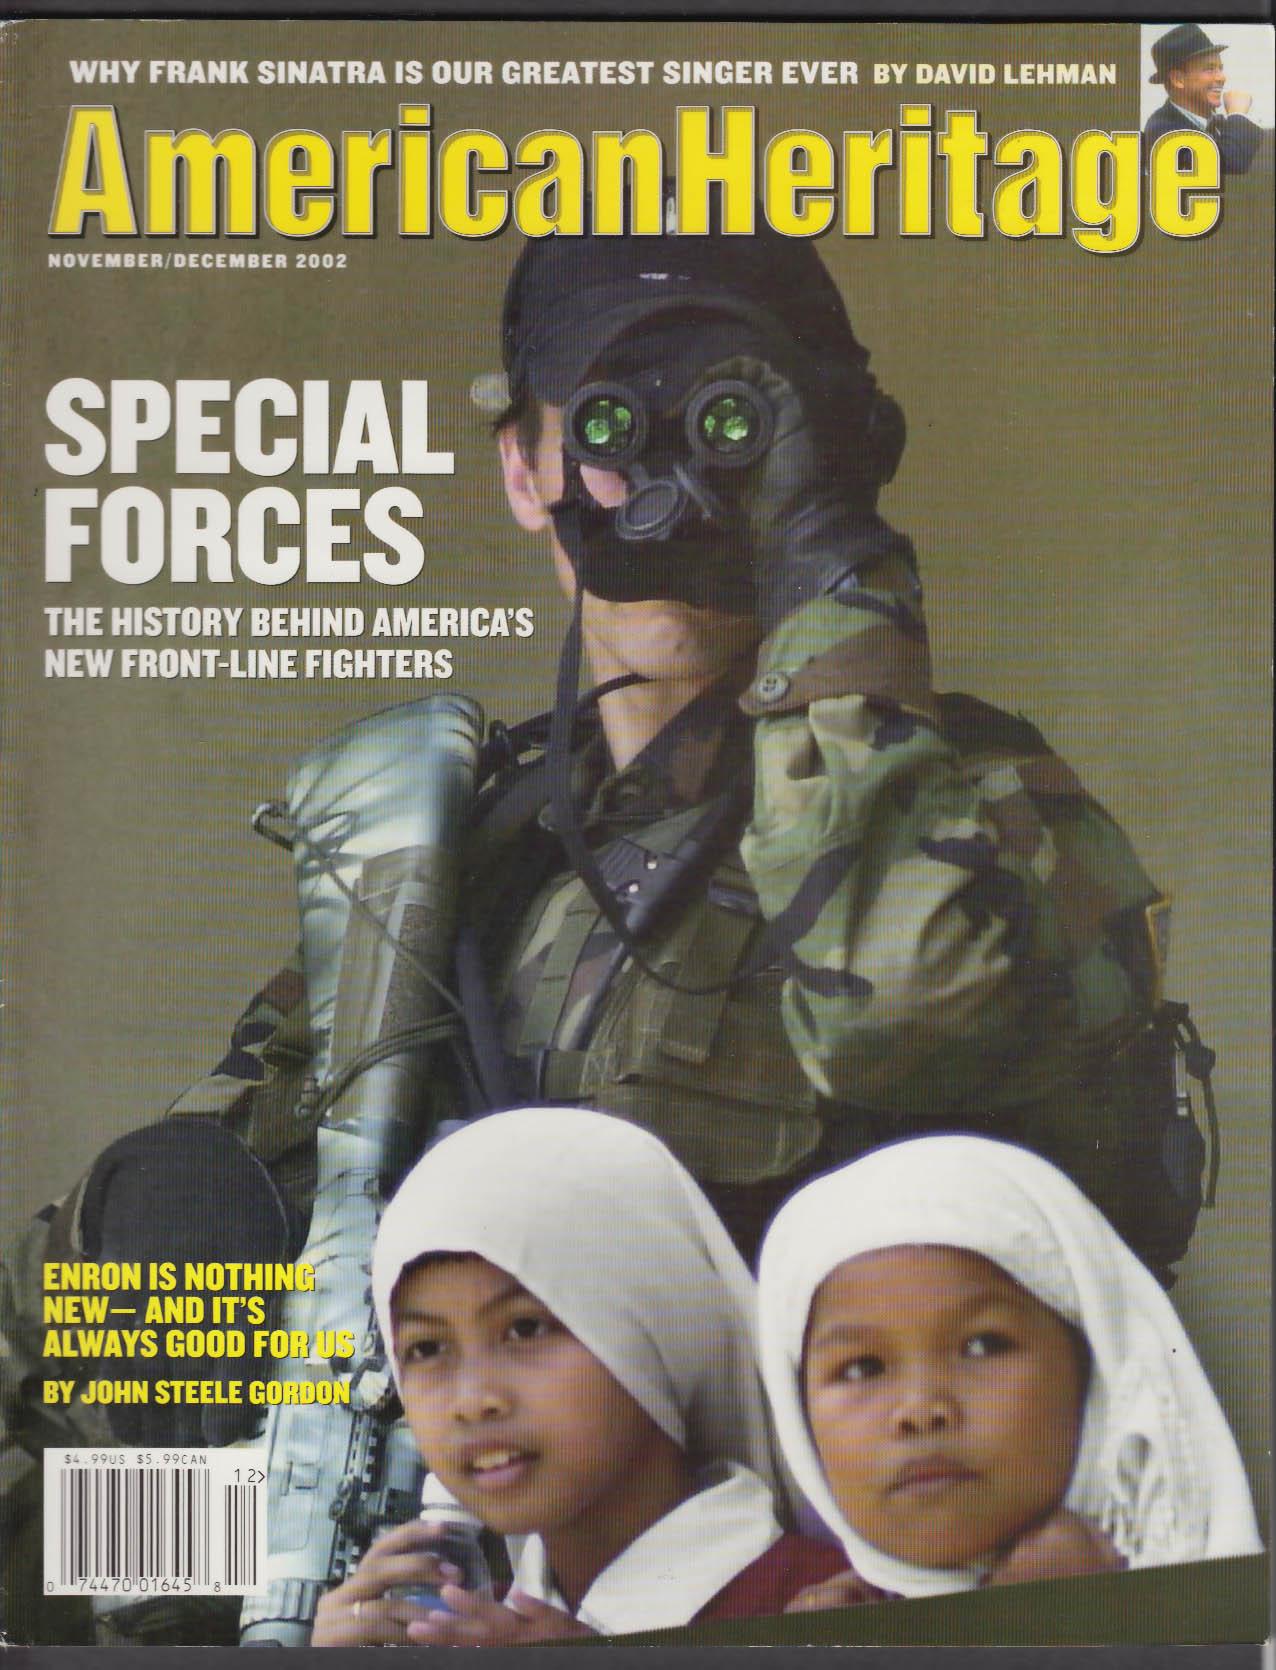 AMERICAN HERITAGE Frank Sinatra Enron Special Forces + 11-12 2002